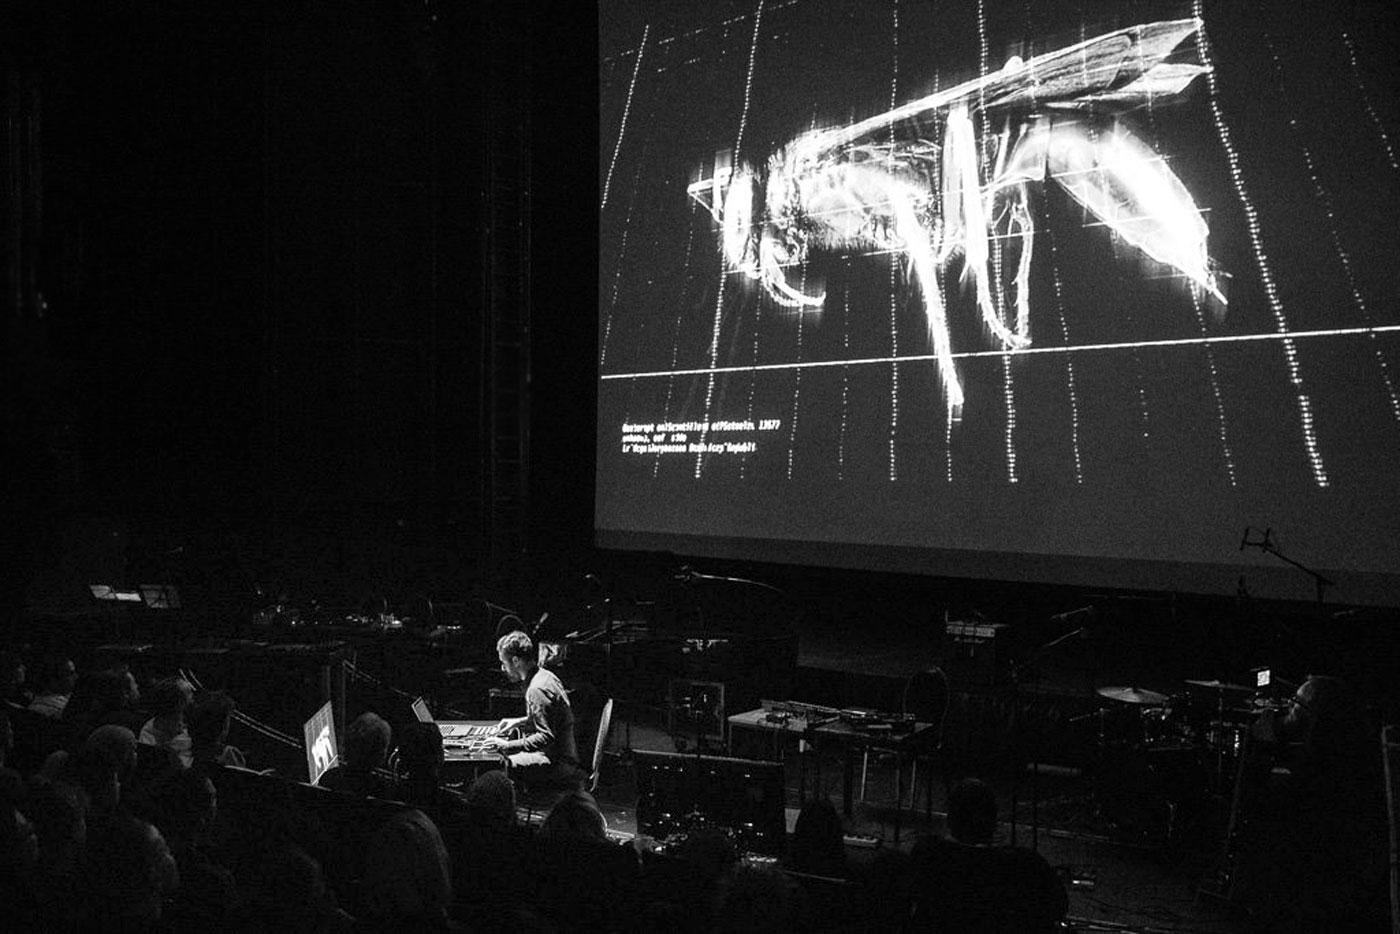 POLITIK, live music set byBasar Ünder ensemble, Volksbühne Theater, Berlin (D), 2017